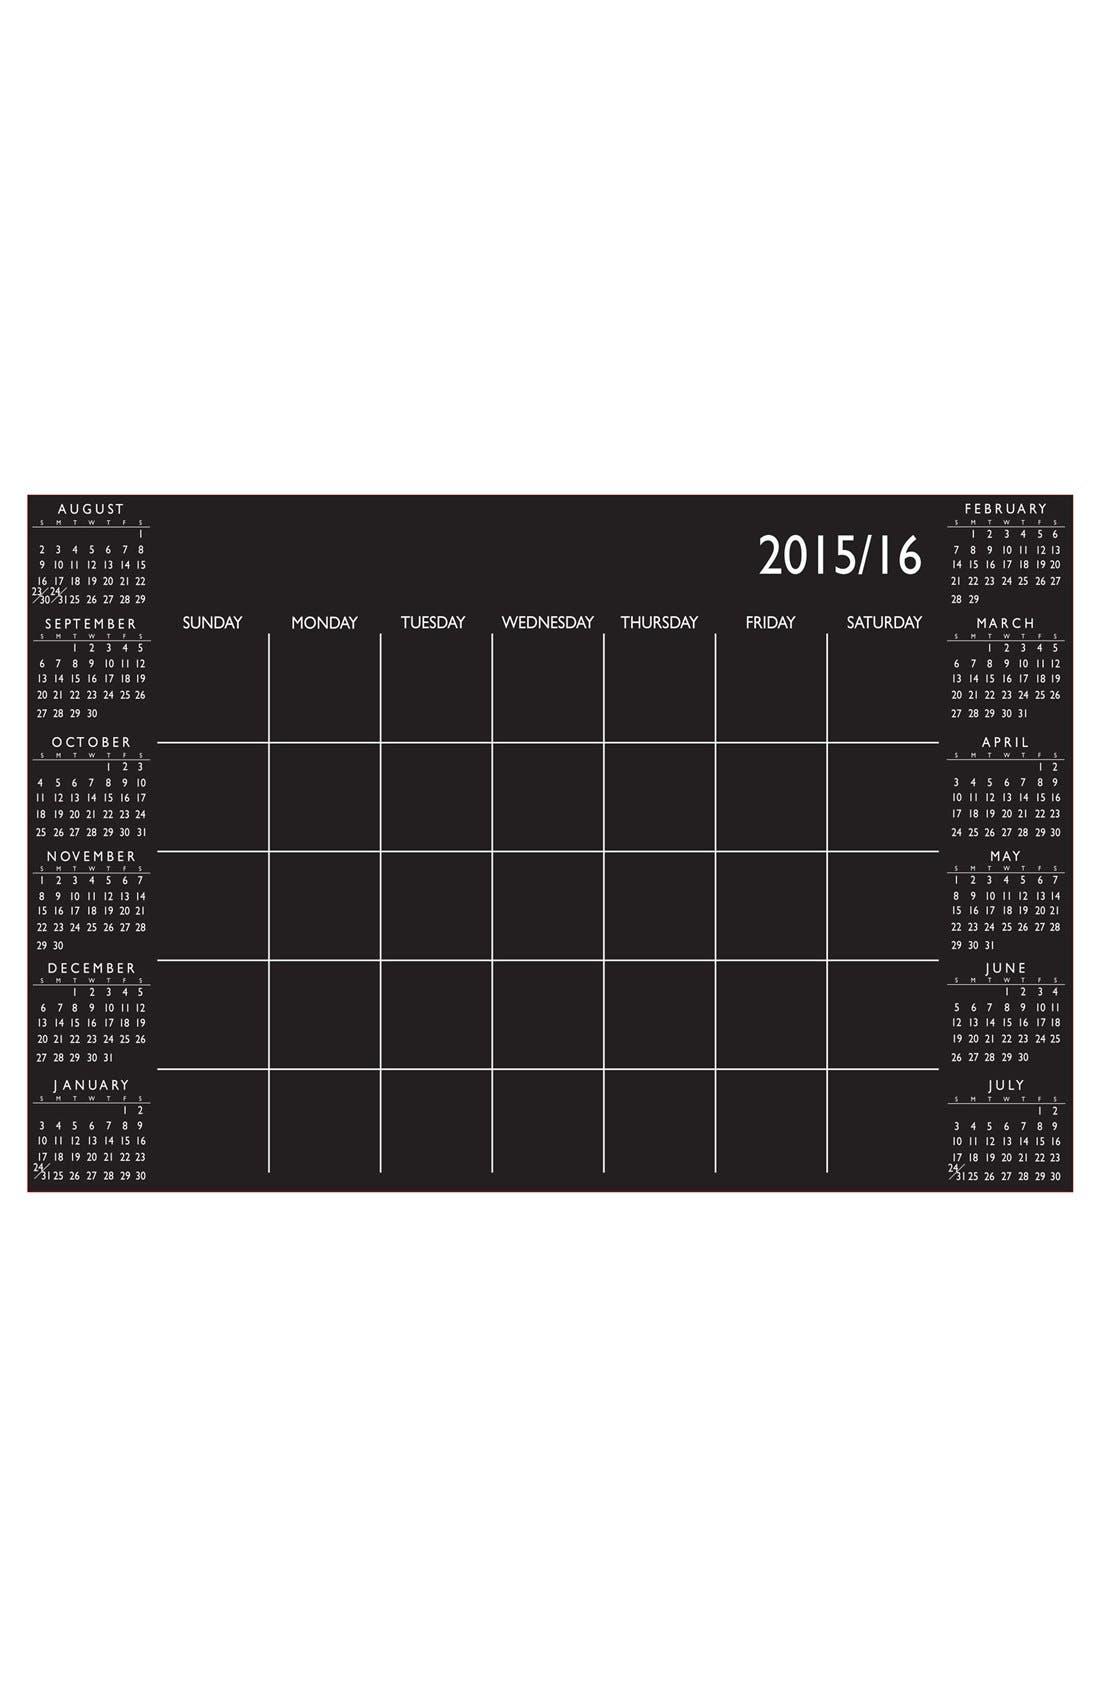 Alternate Image 1 Selected - Wallpops Academic Dry Erase Calendar Wall Decal